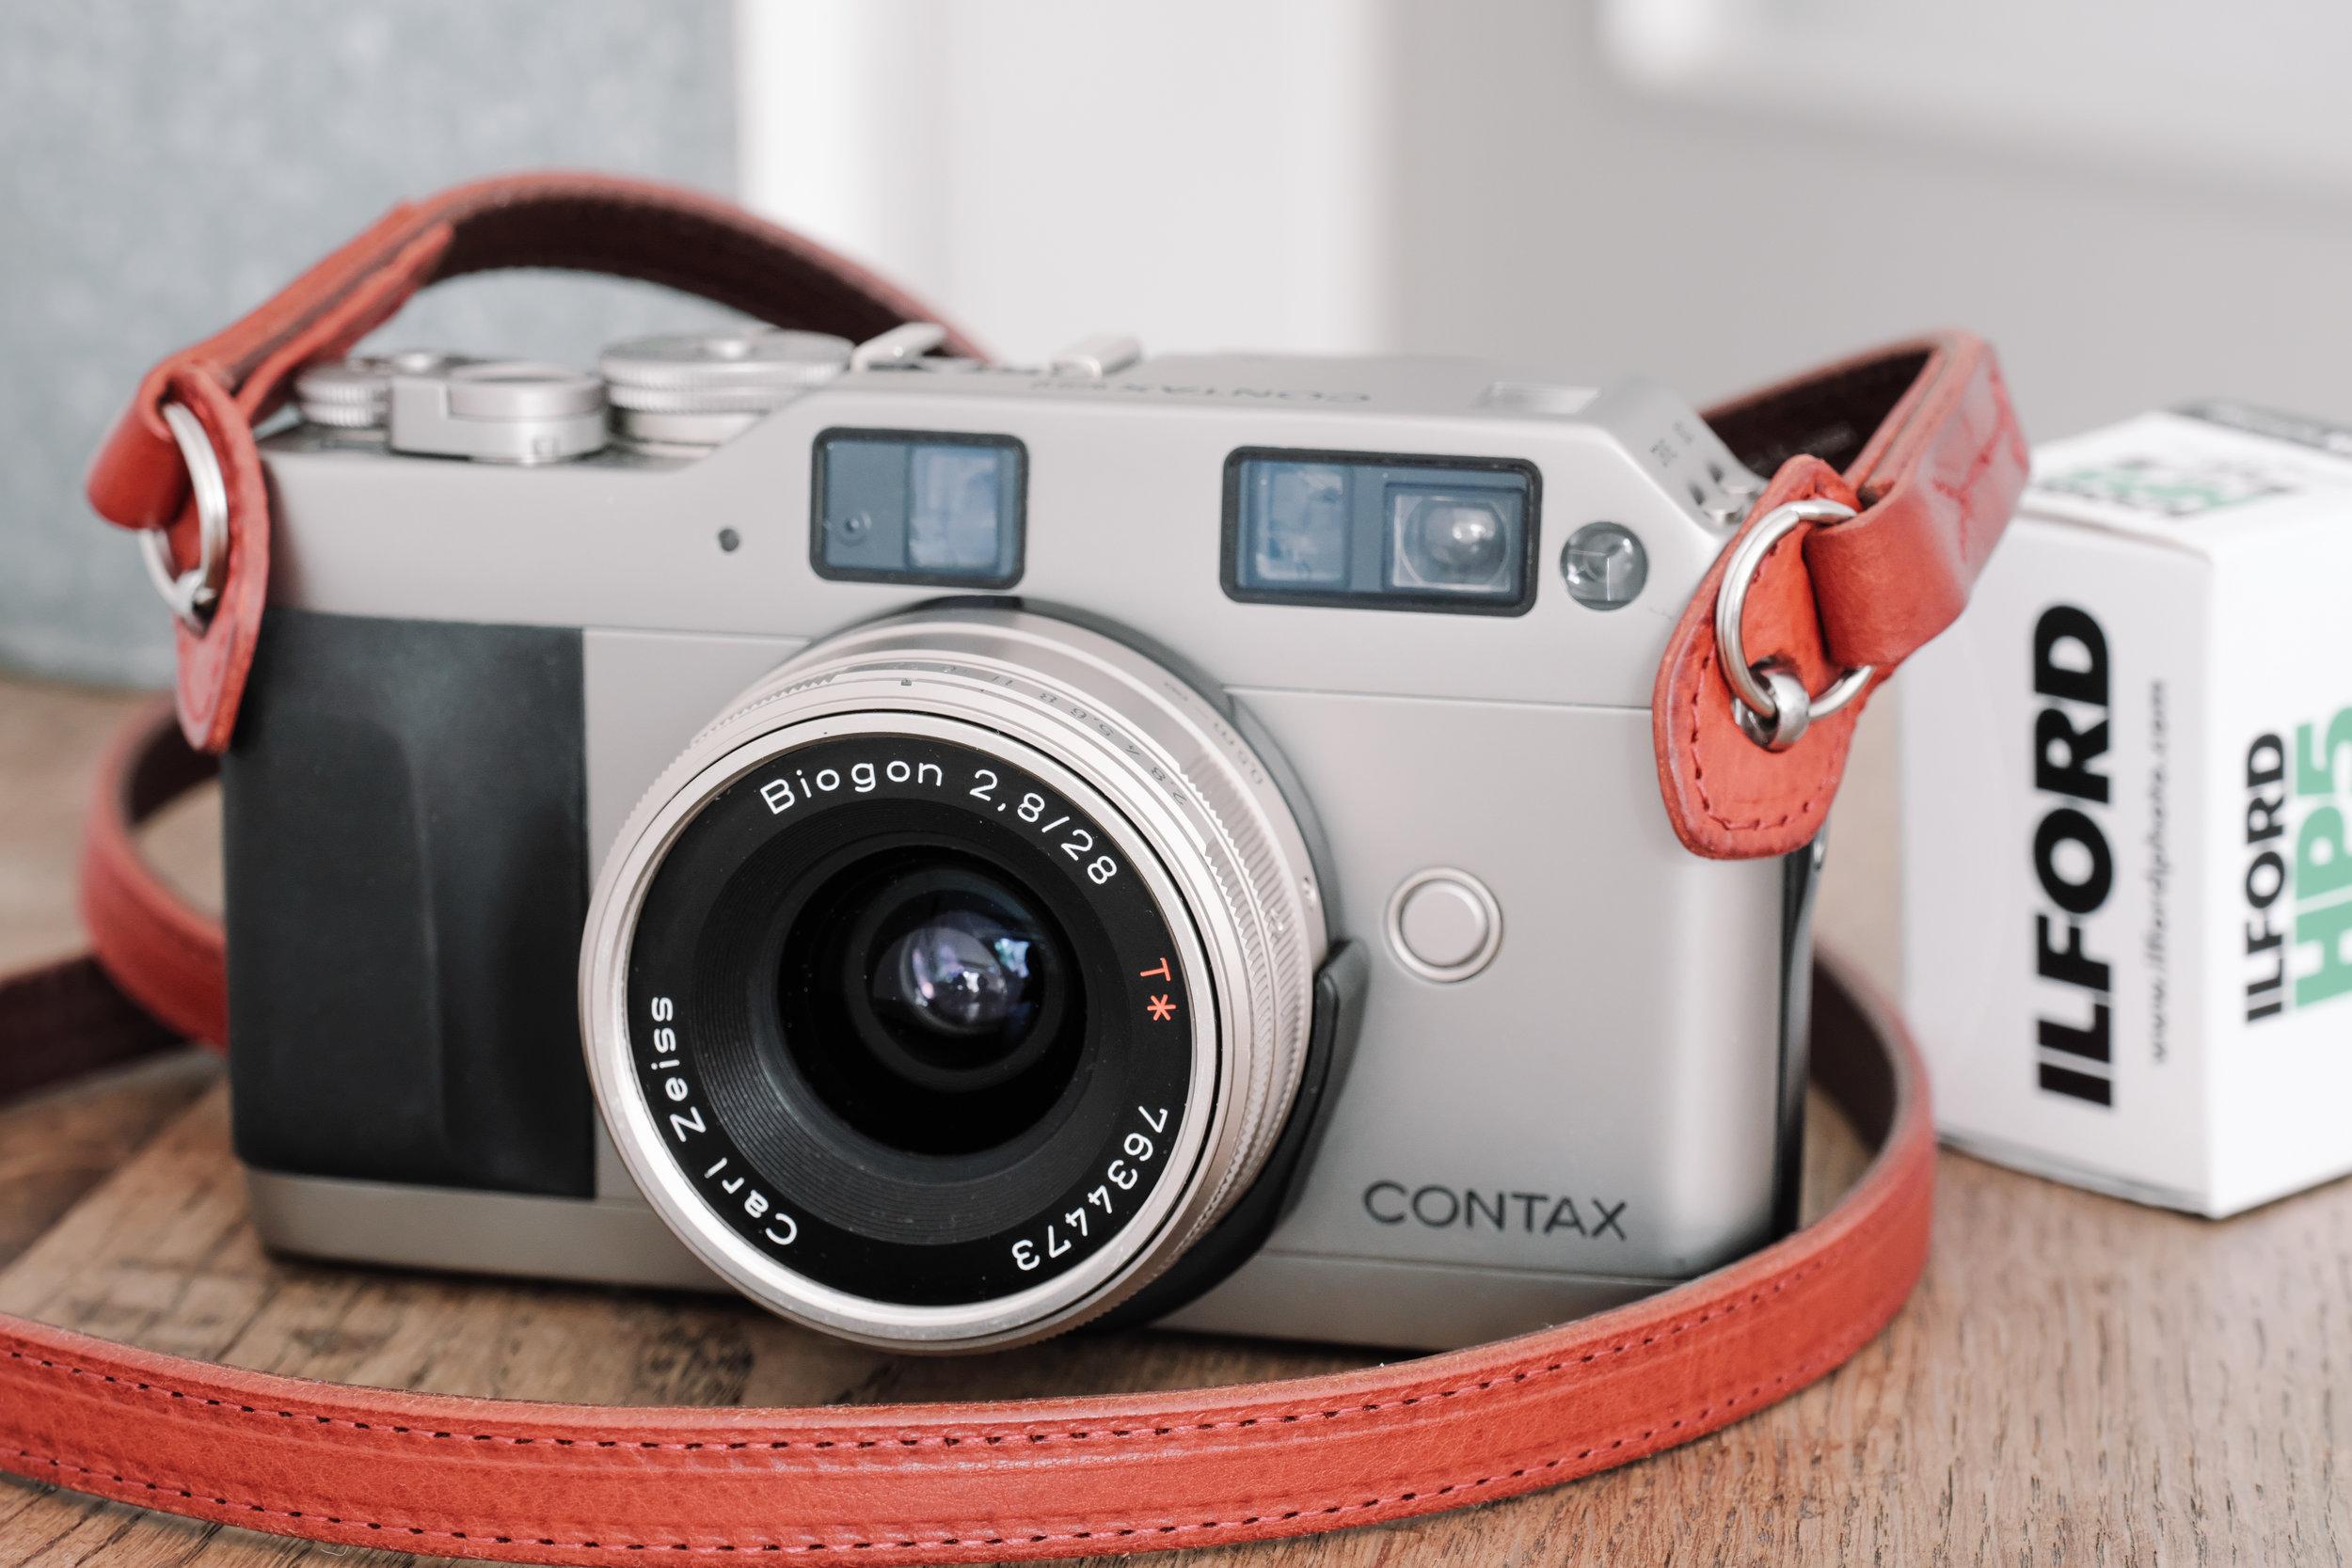 Contax G1 mit Carl Zeiss Biogon 2.8/28 (Foto:  Oliver Symens )